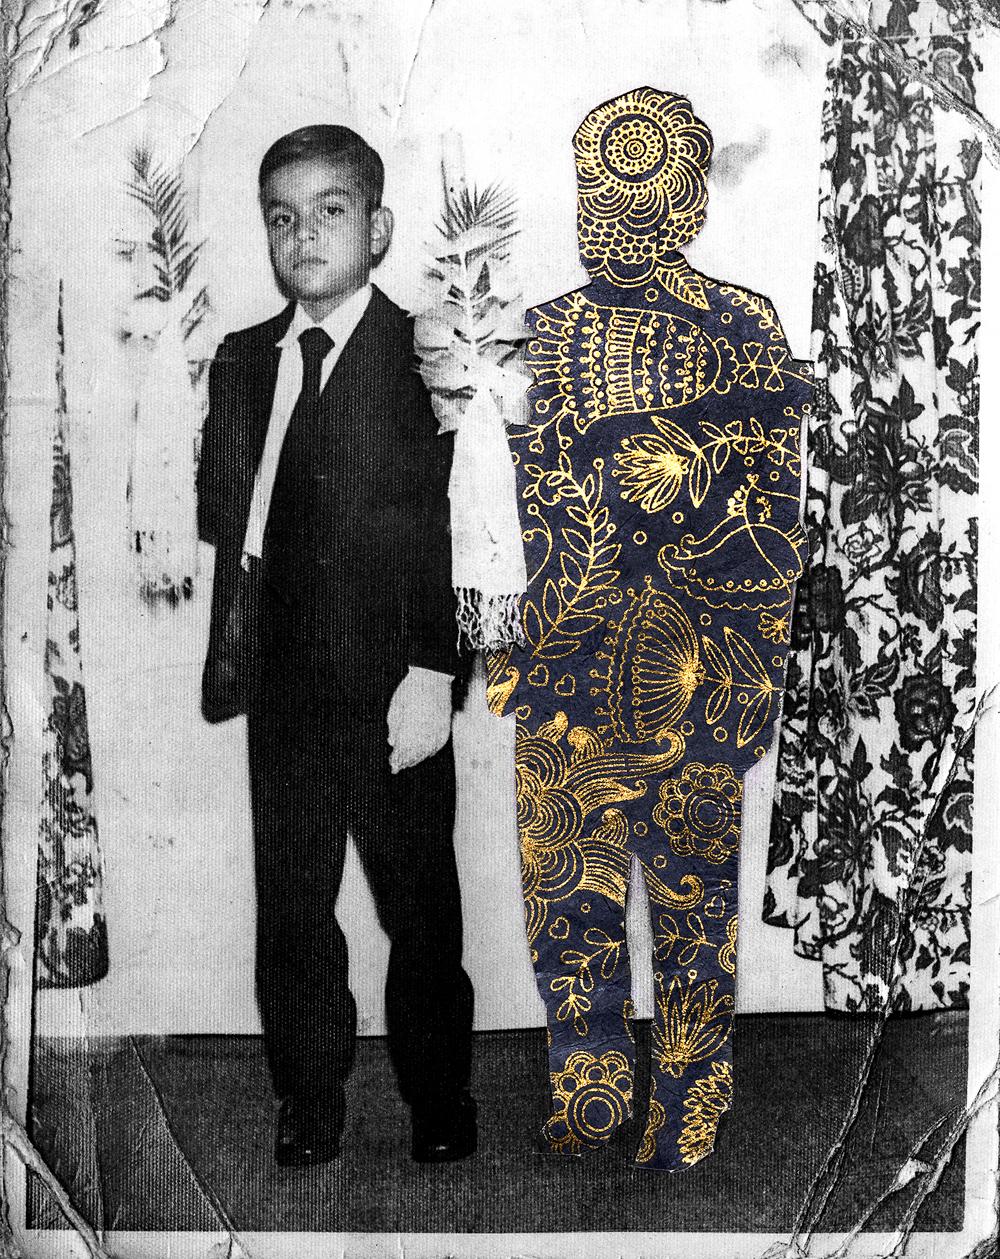 Communion1972, Fragments of the Masculine © Antonio Pulgarin